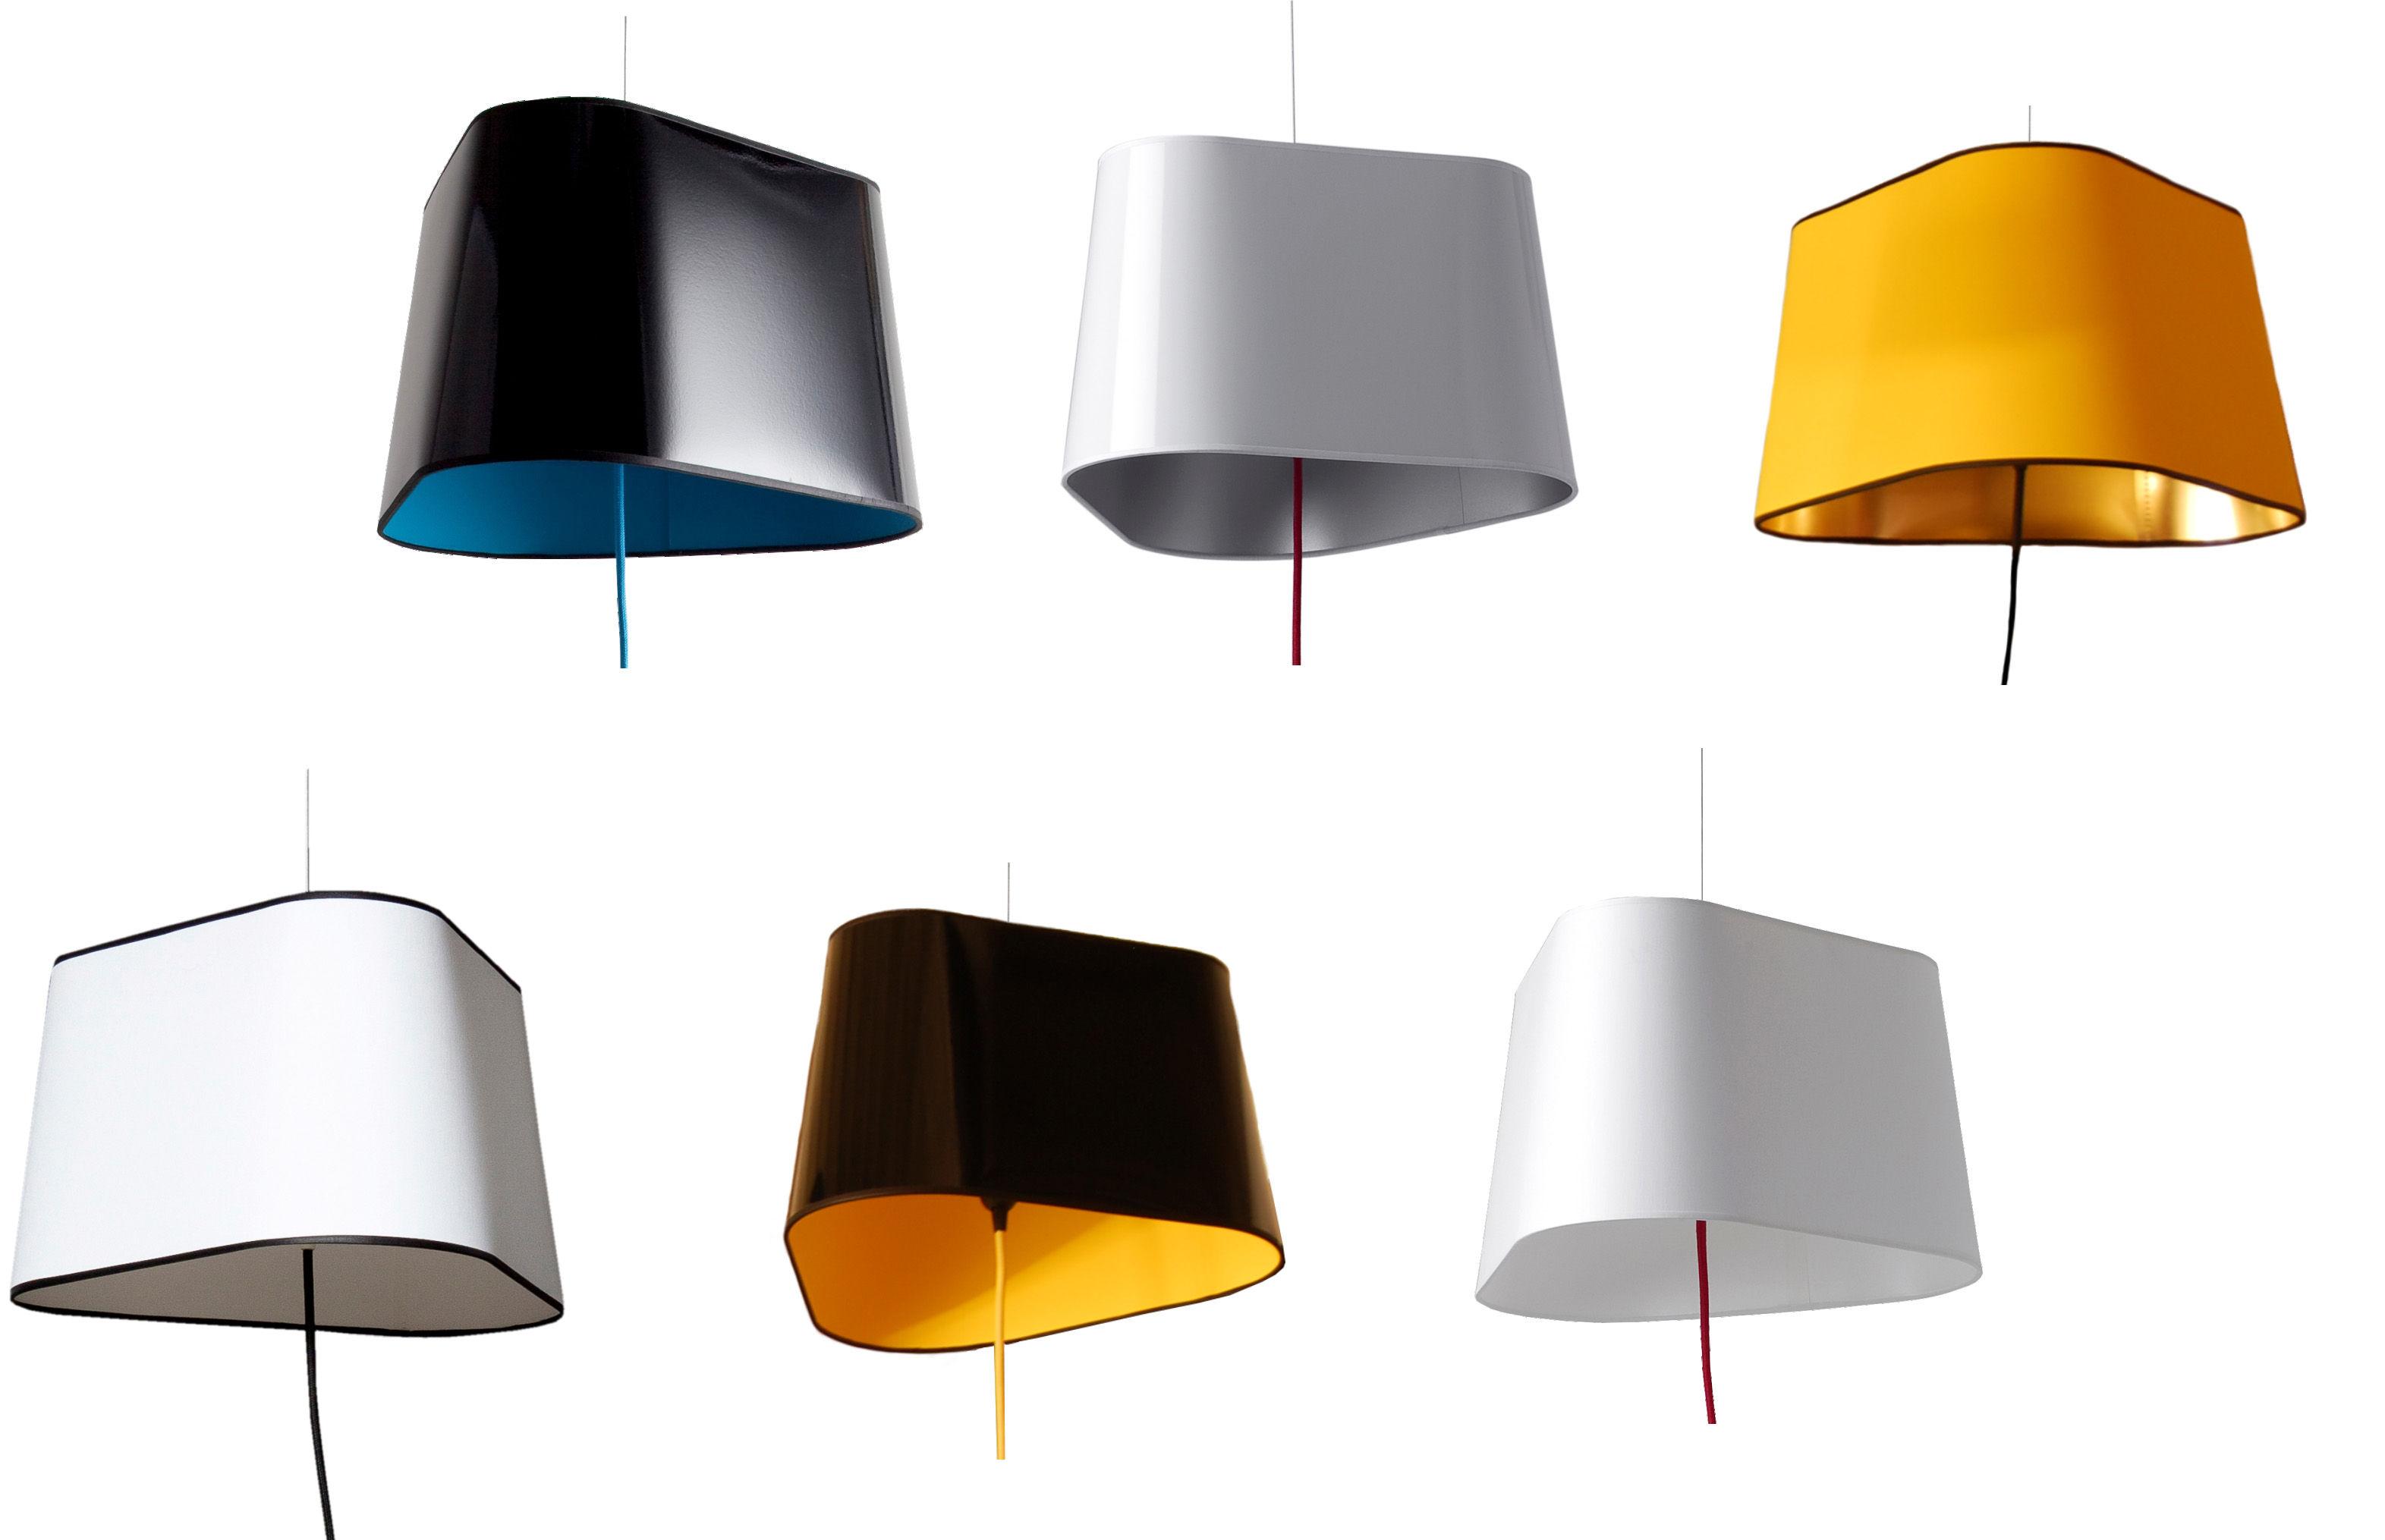 suspension grand nuage 10 abat jours noir jaune or designheure. Black Bedroom Furniture Sets. Home Design Ideas